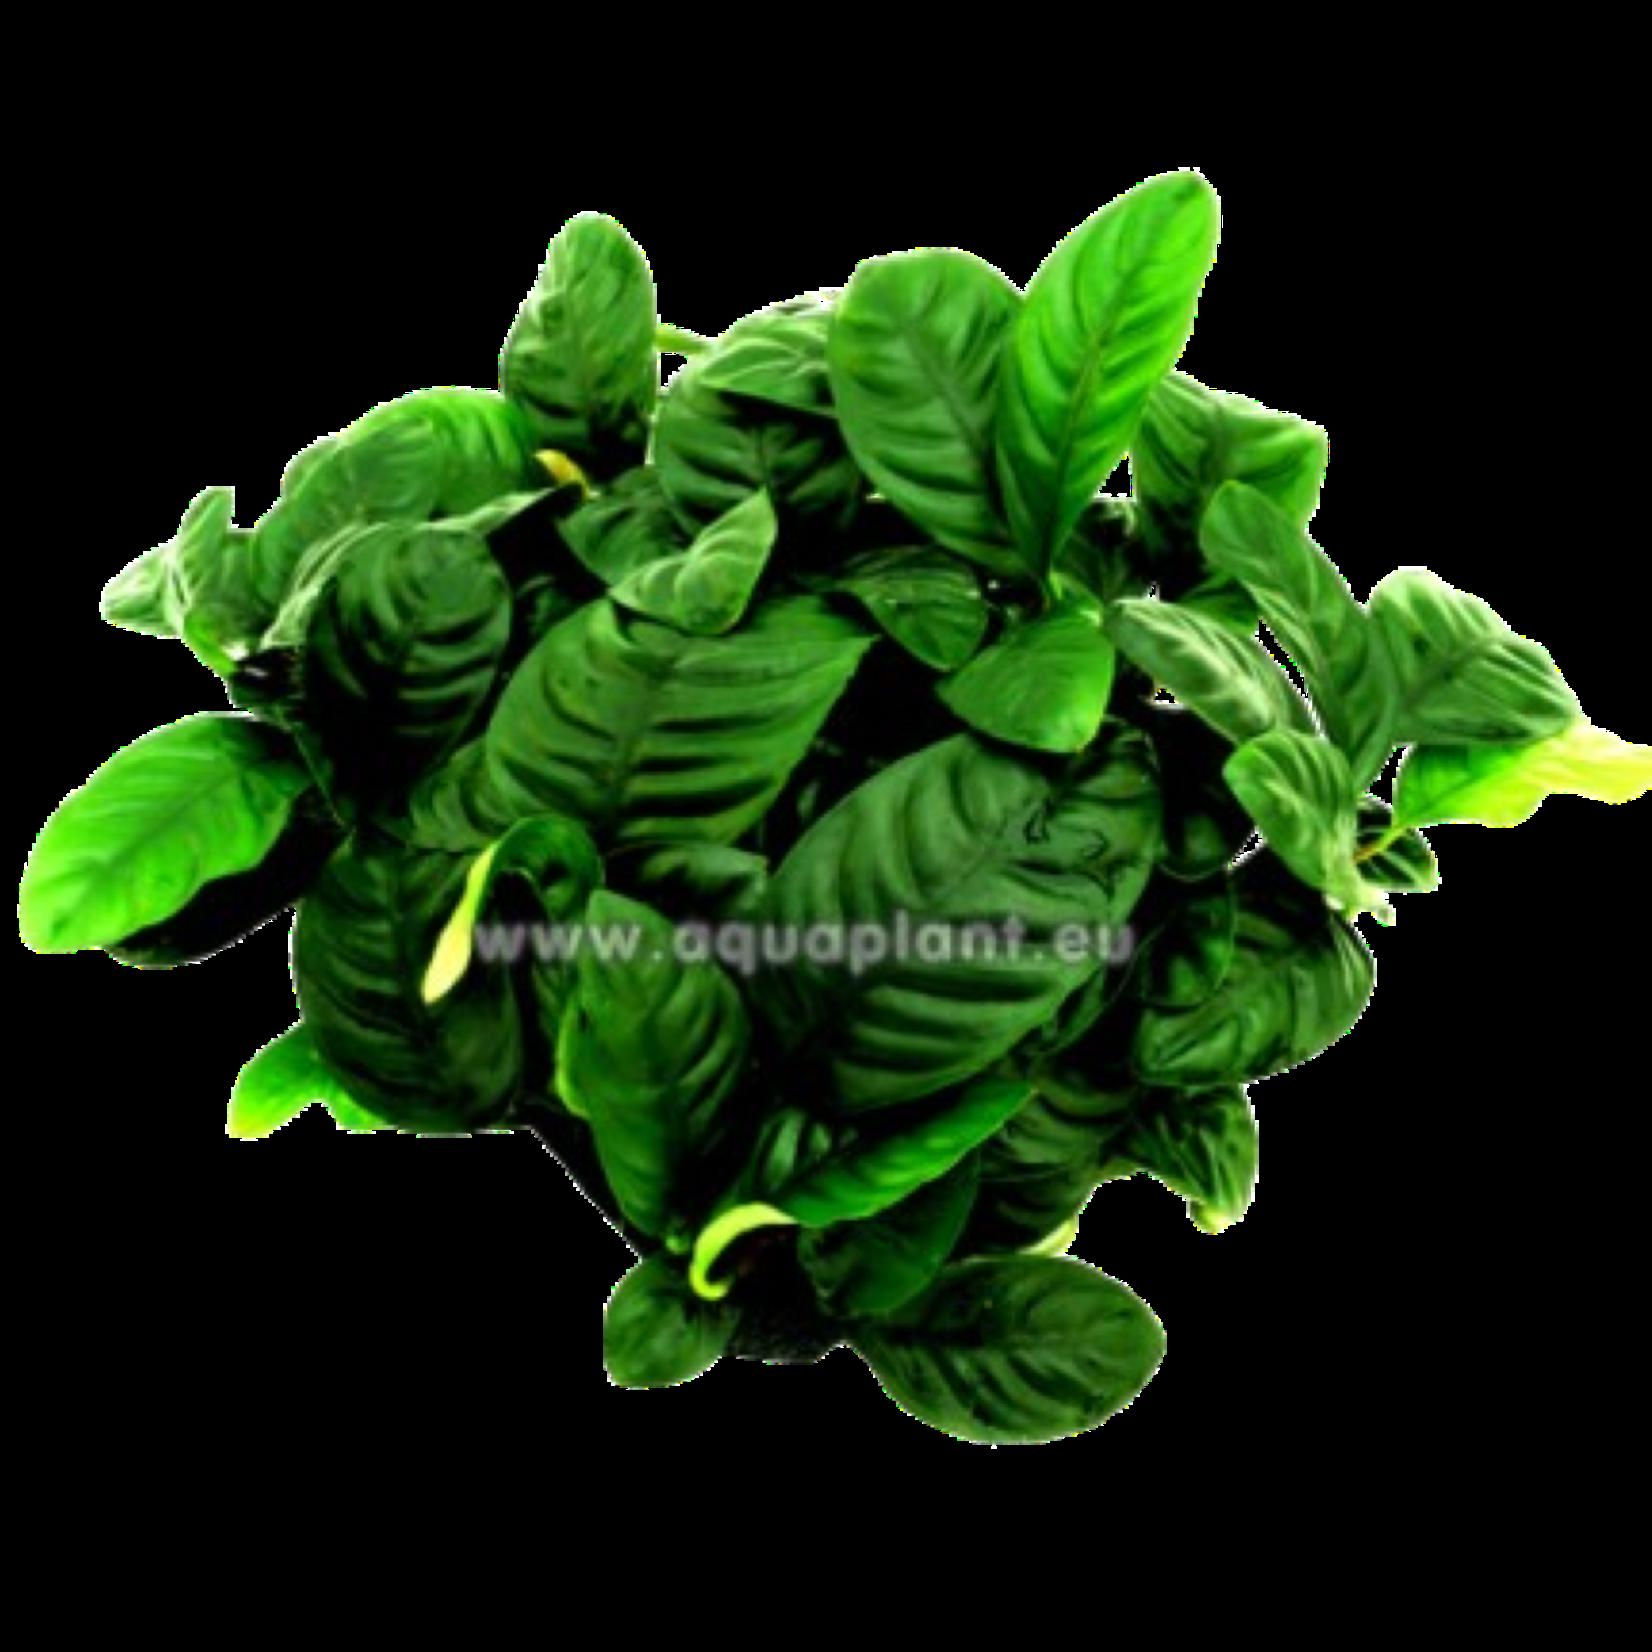 Epaqmat Coffeefolia - Green wall 16.5x13cm